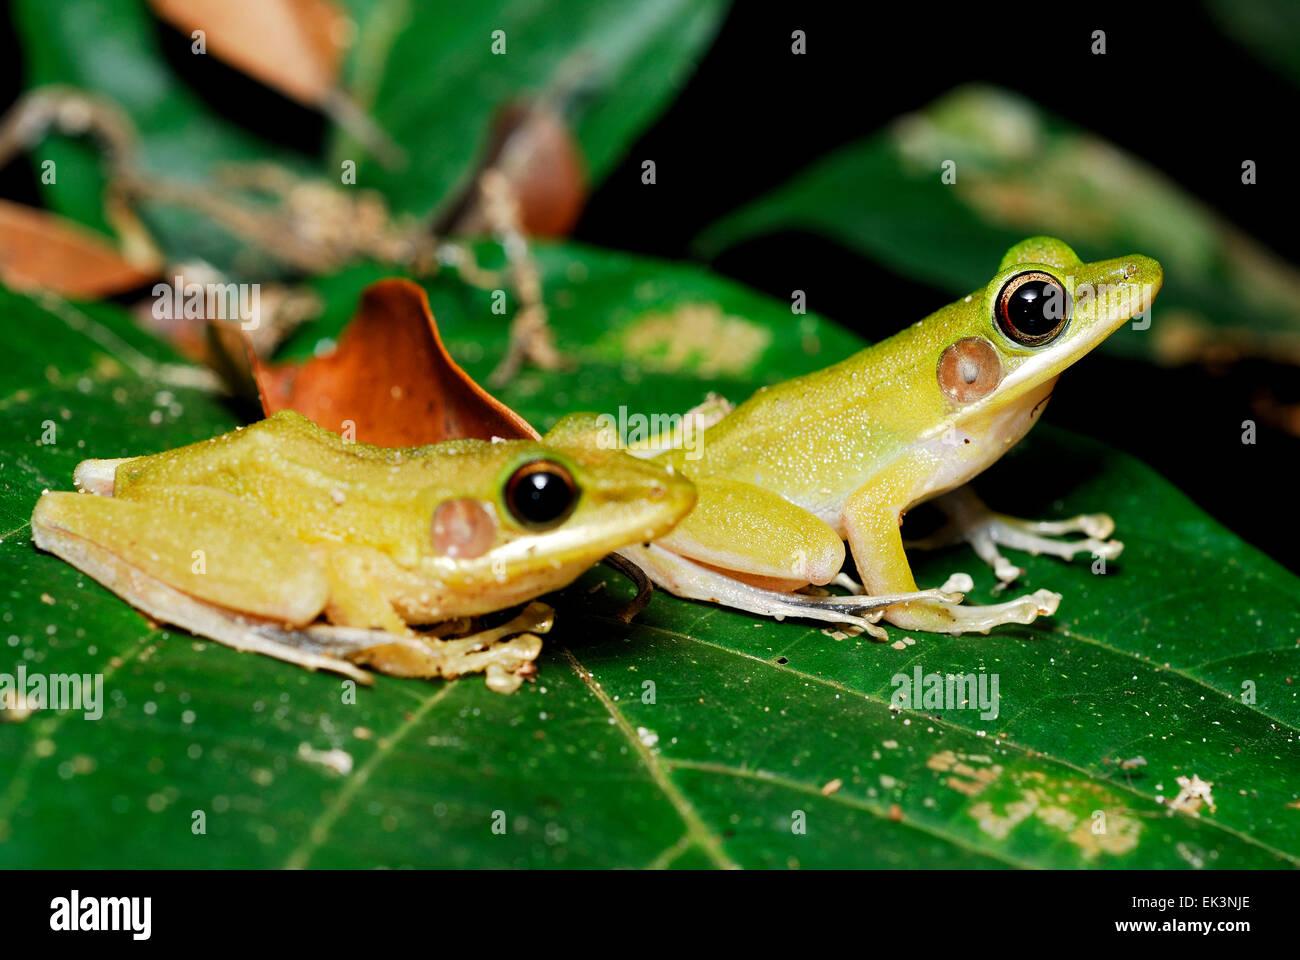 Green frogs (Hylarana raniceps) on a green leaf in Kubah, Sarawak, Malaysia, Borneo - Stock Image